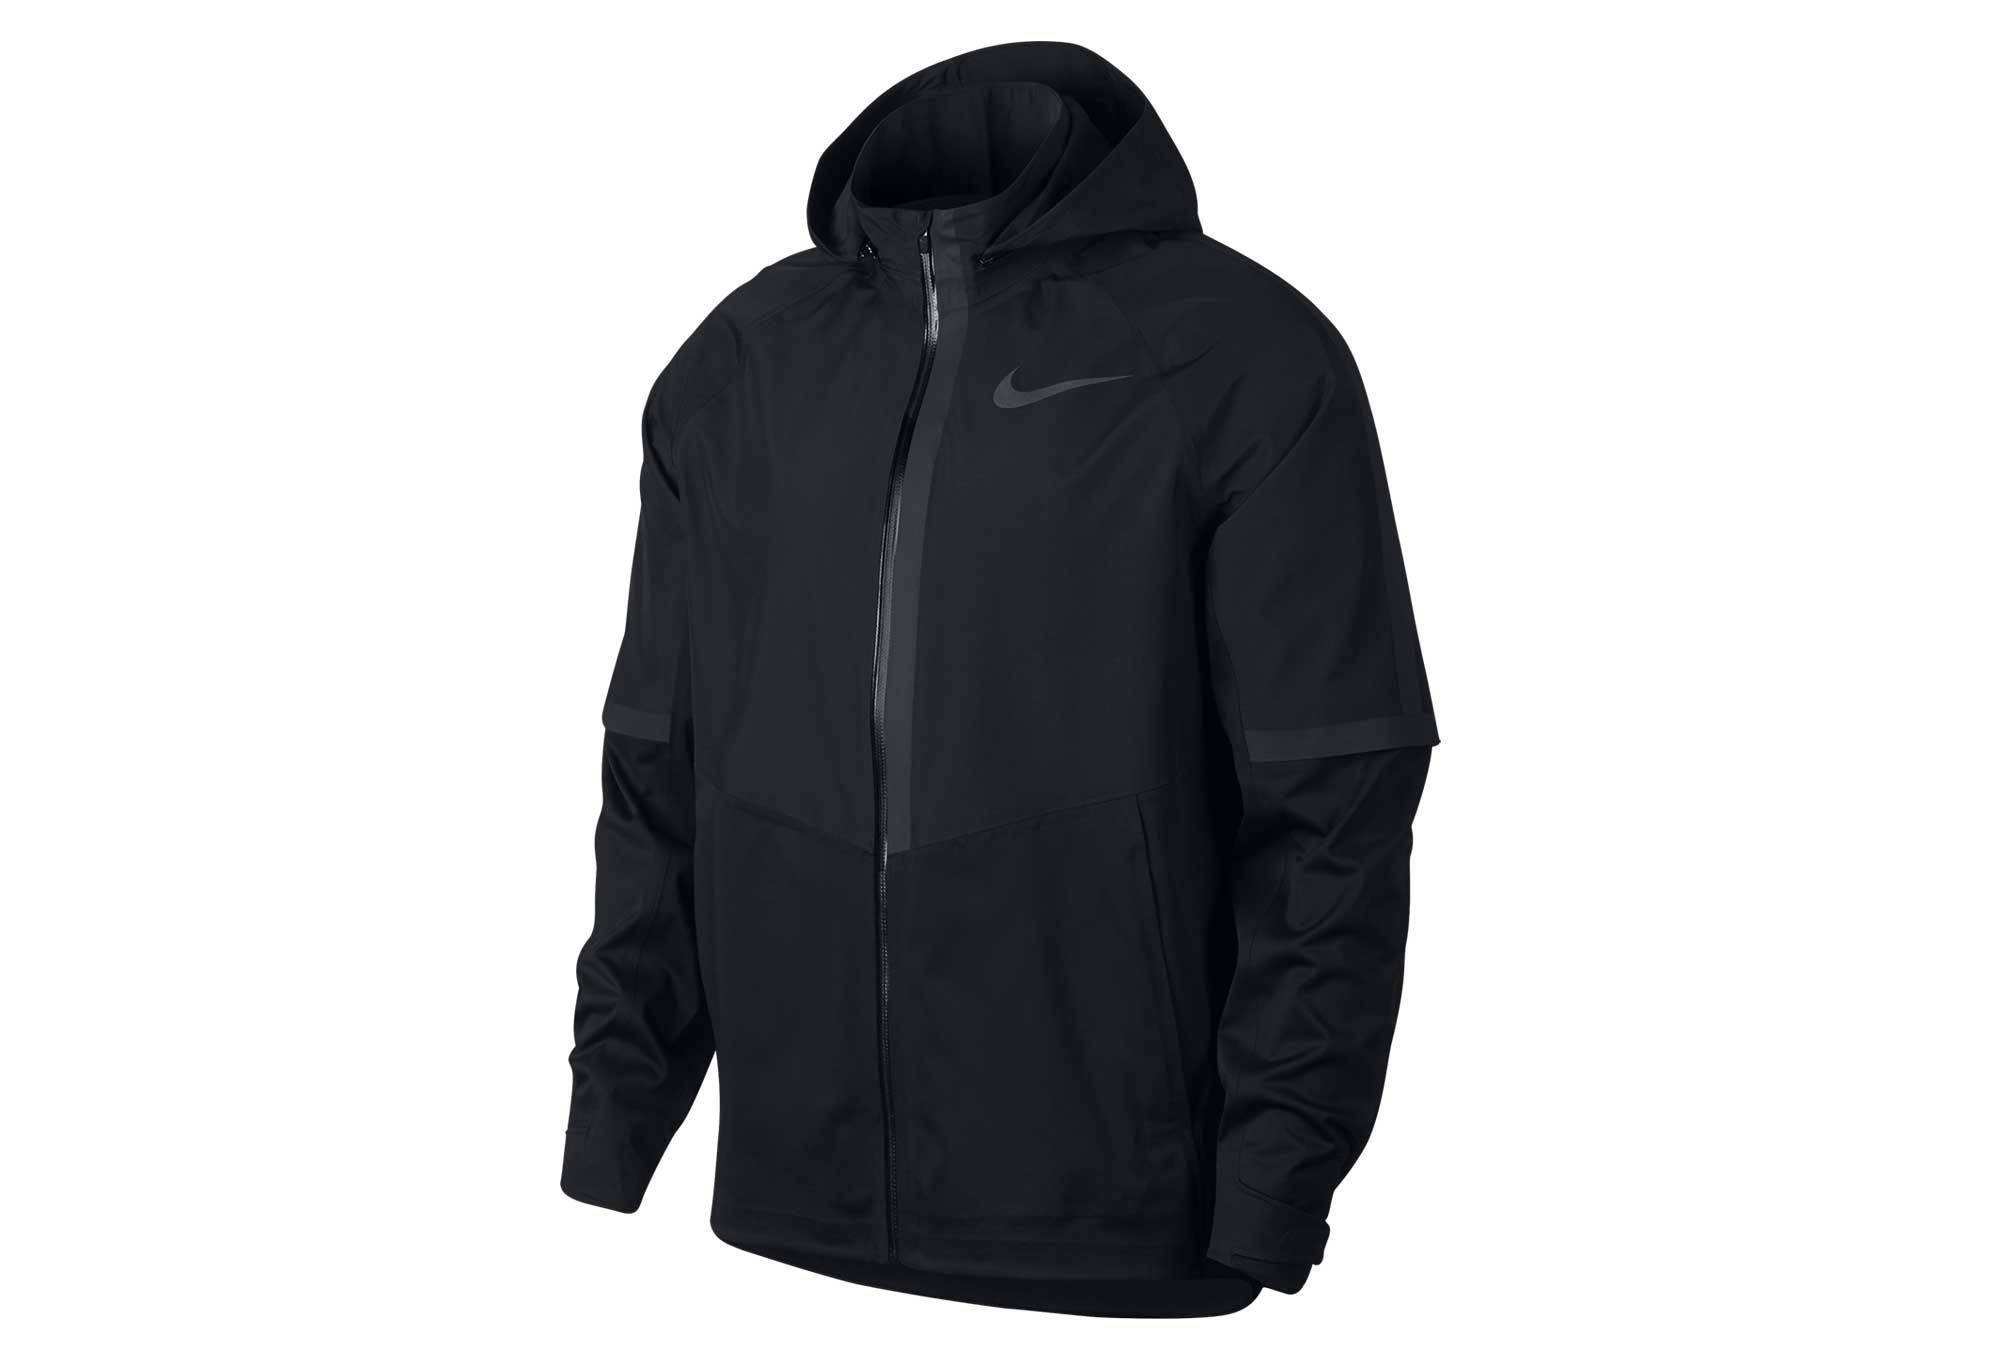 6ecda25390a6 Veste Imperméable Nike AeroShield Noir Homme